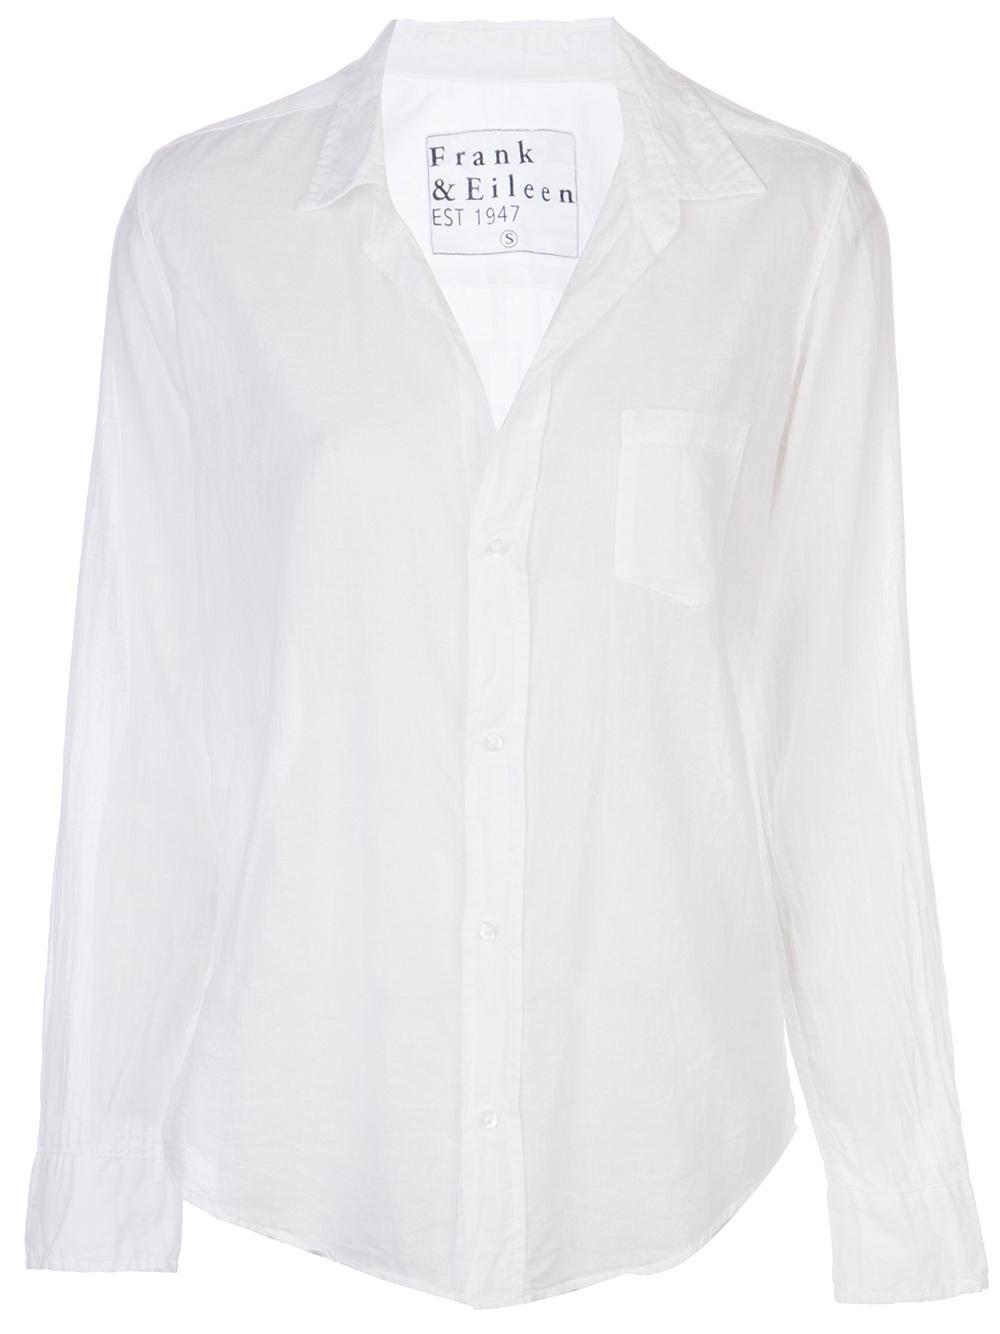 6c6e80fe61 Lyst - Frank   Eileen Voile Barry Shirt in White